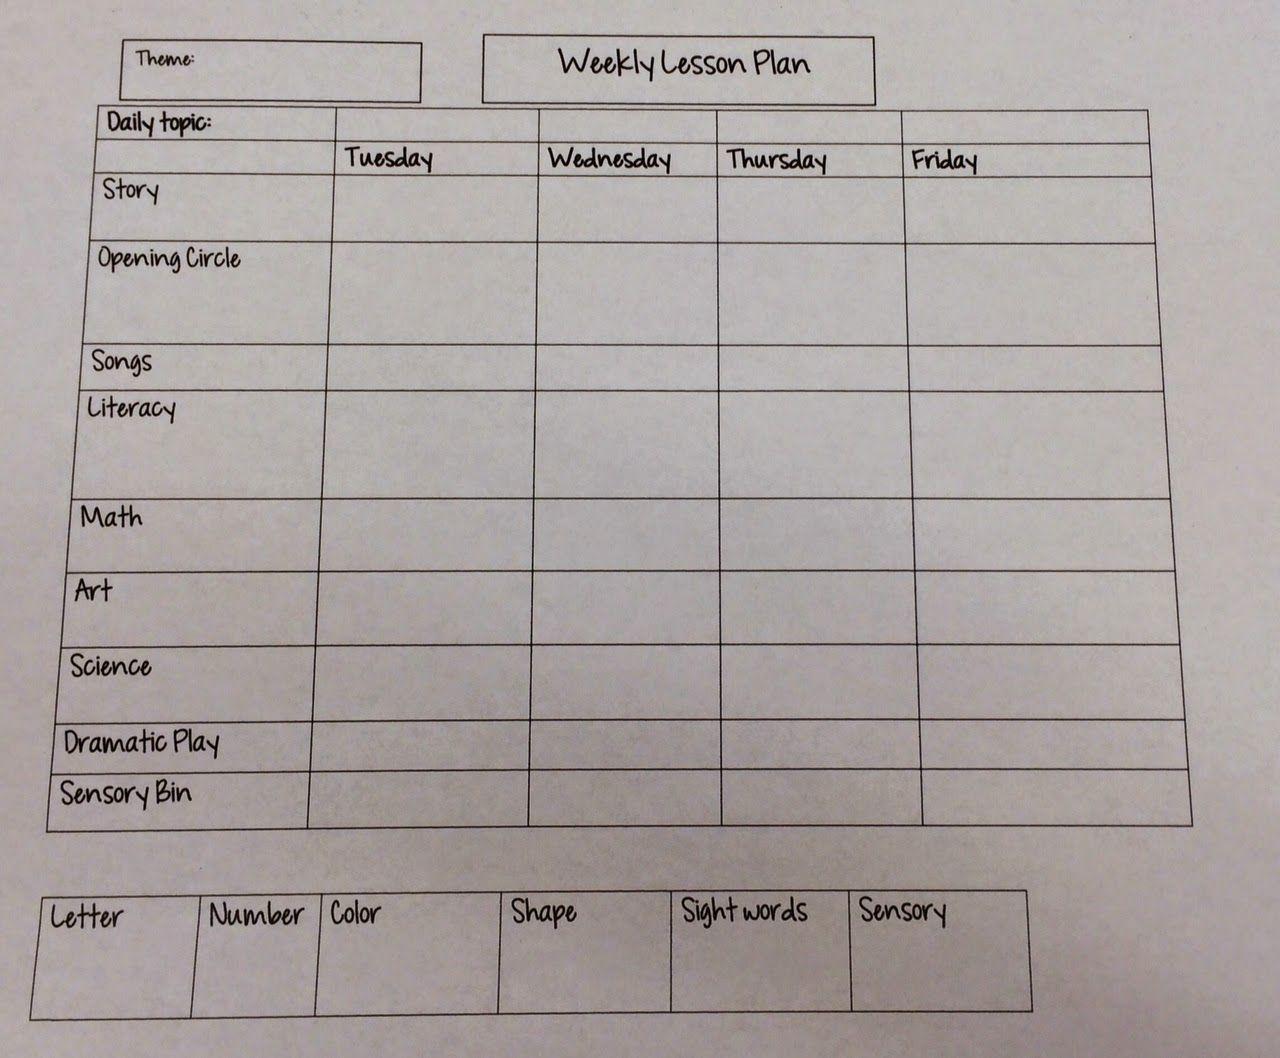 Miss Nicoles Preschool Weekly Lesson Plan Template Preschool - Early childhood education lesson plan template